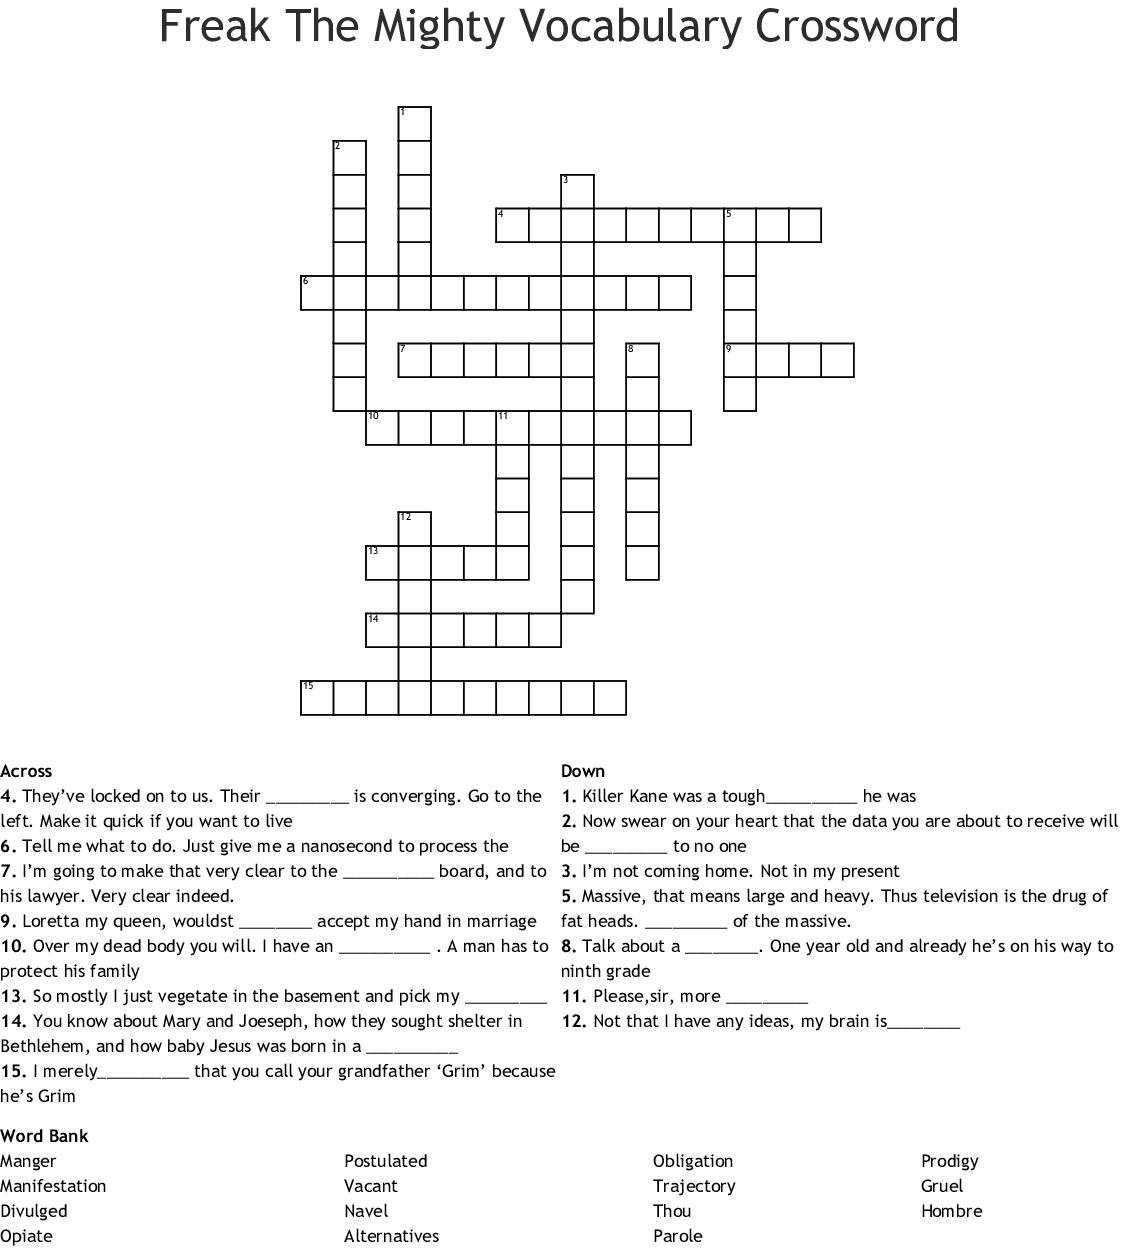 Freak The Mighty Vocabulary Crossword